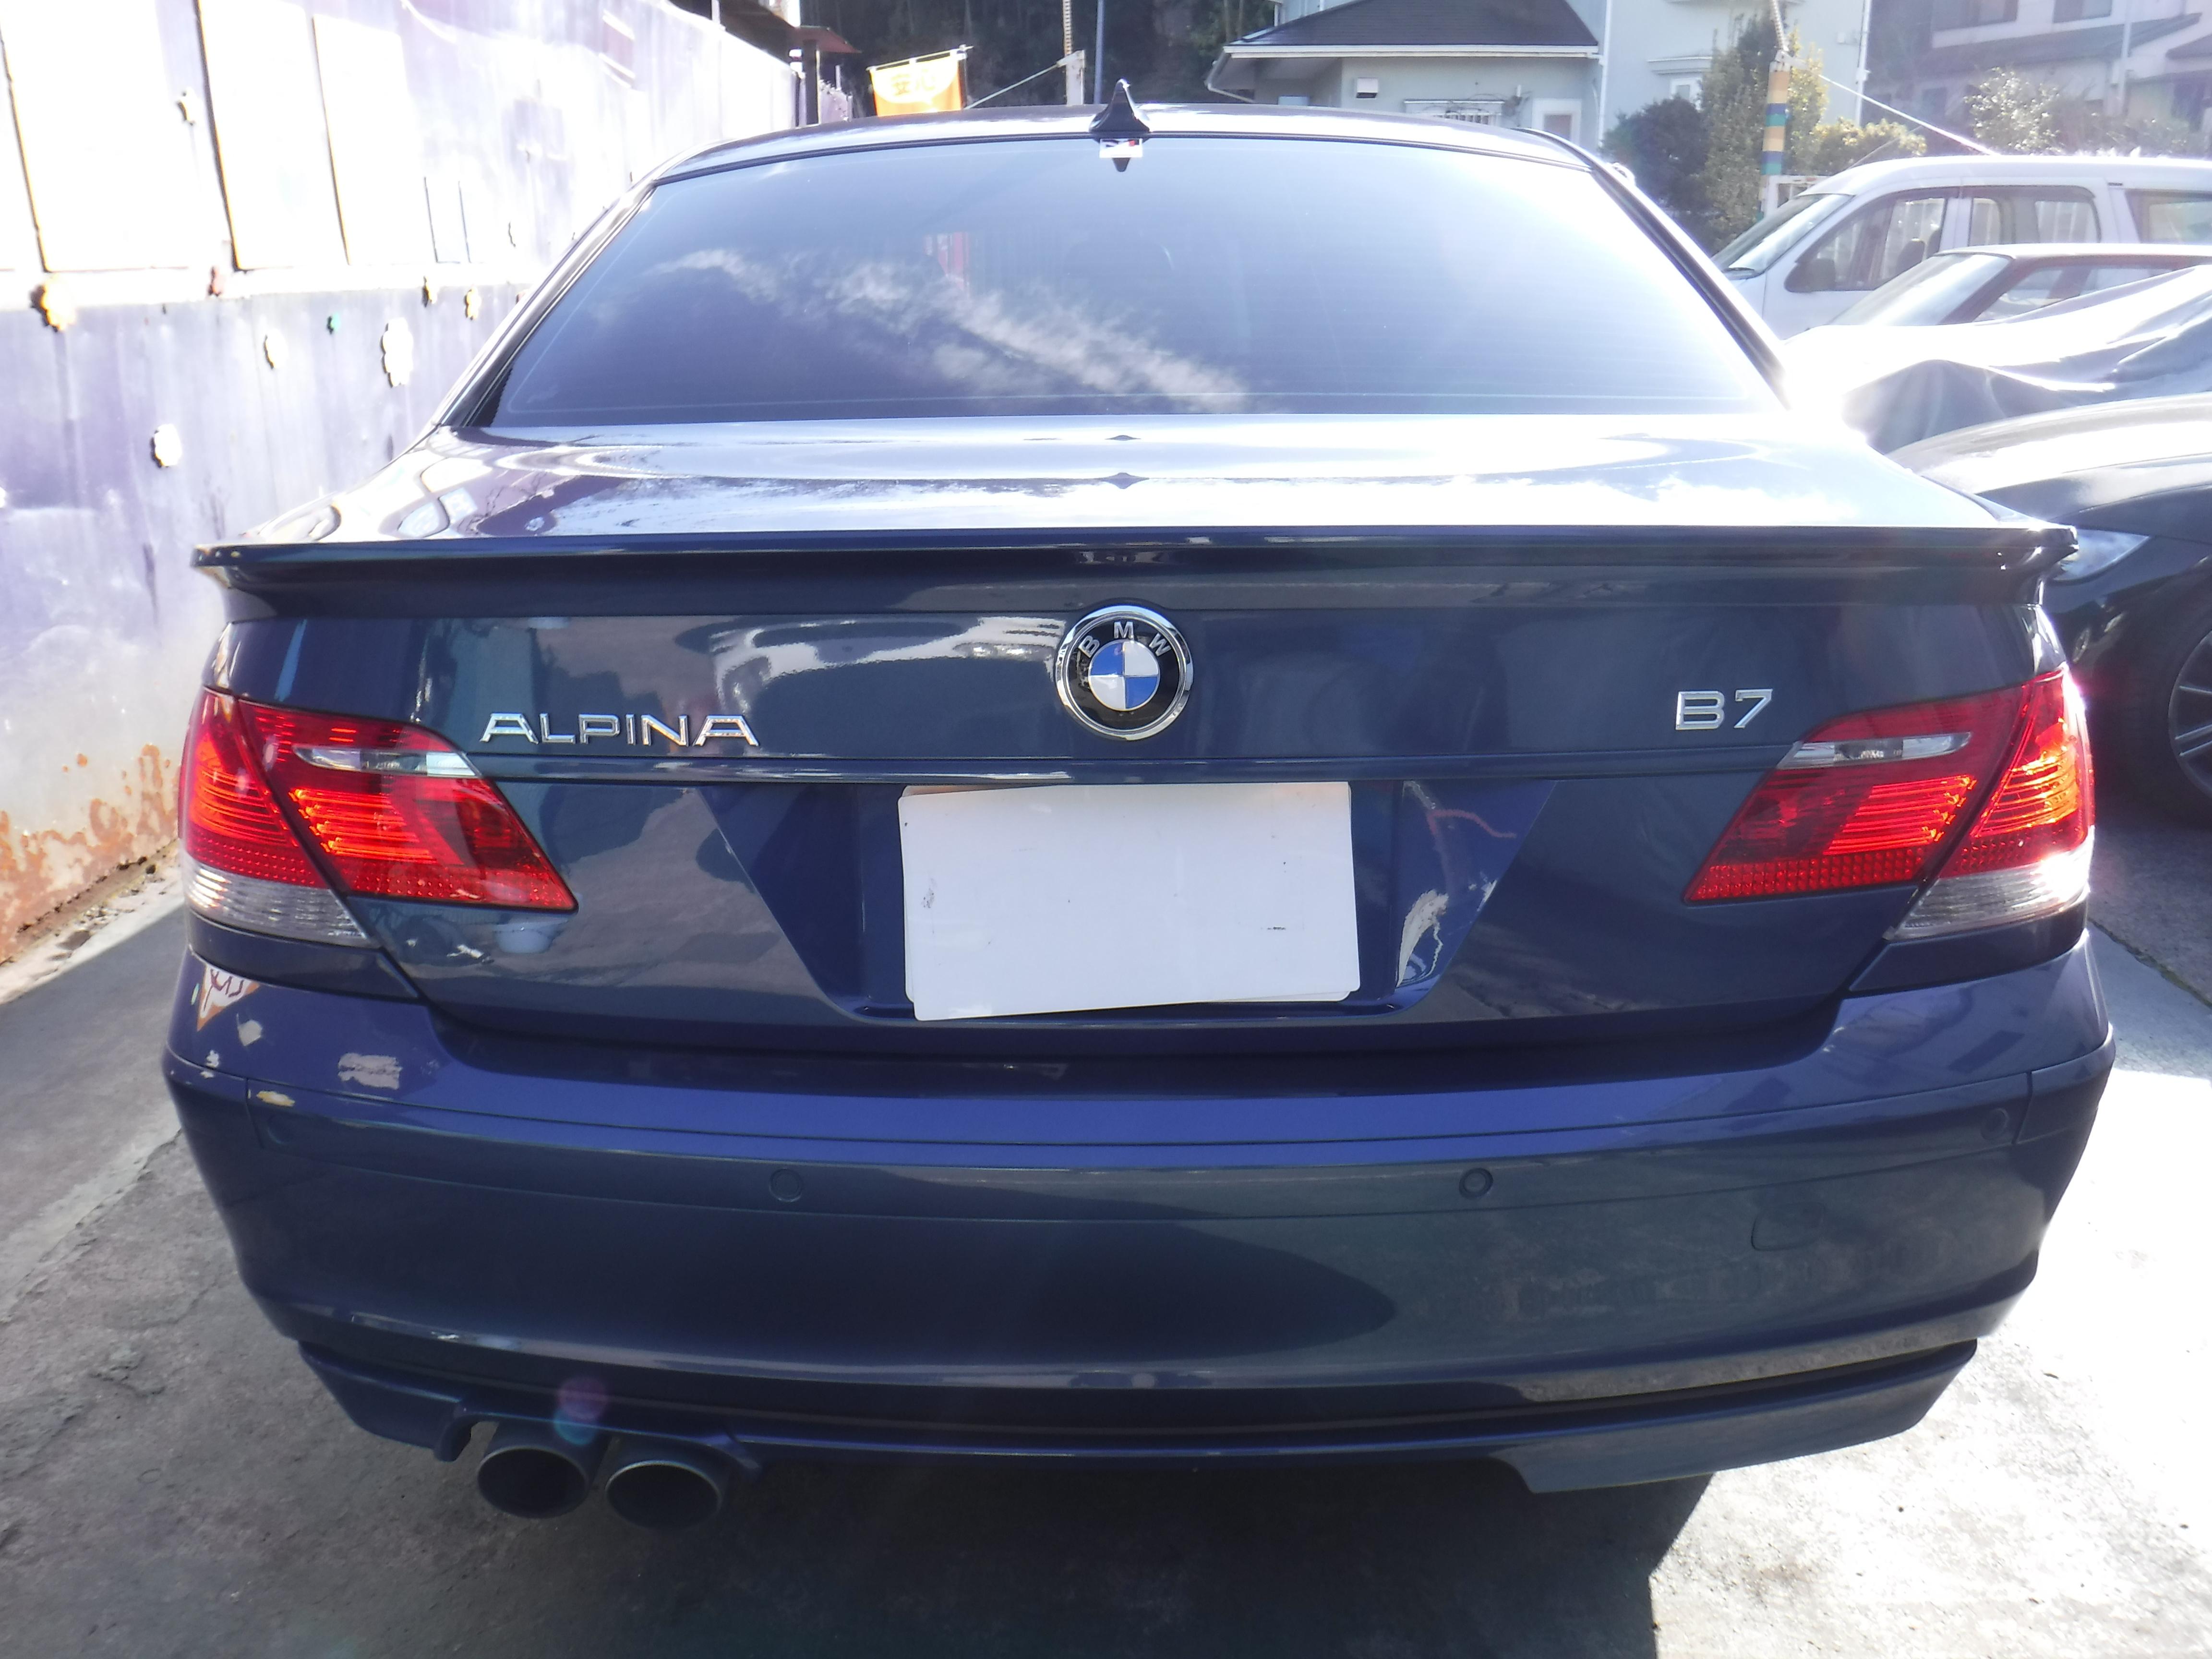 BMW ALPINA B7 スーパーチャージ